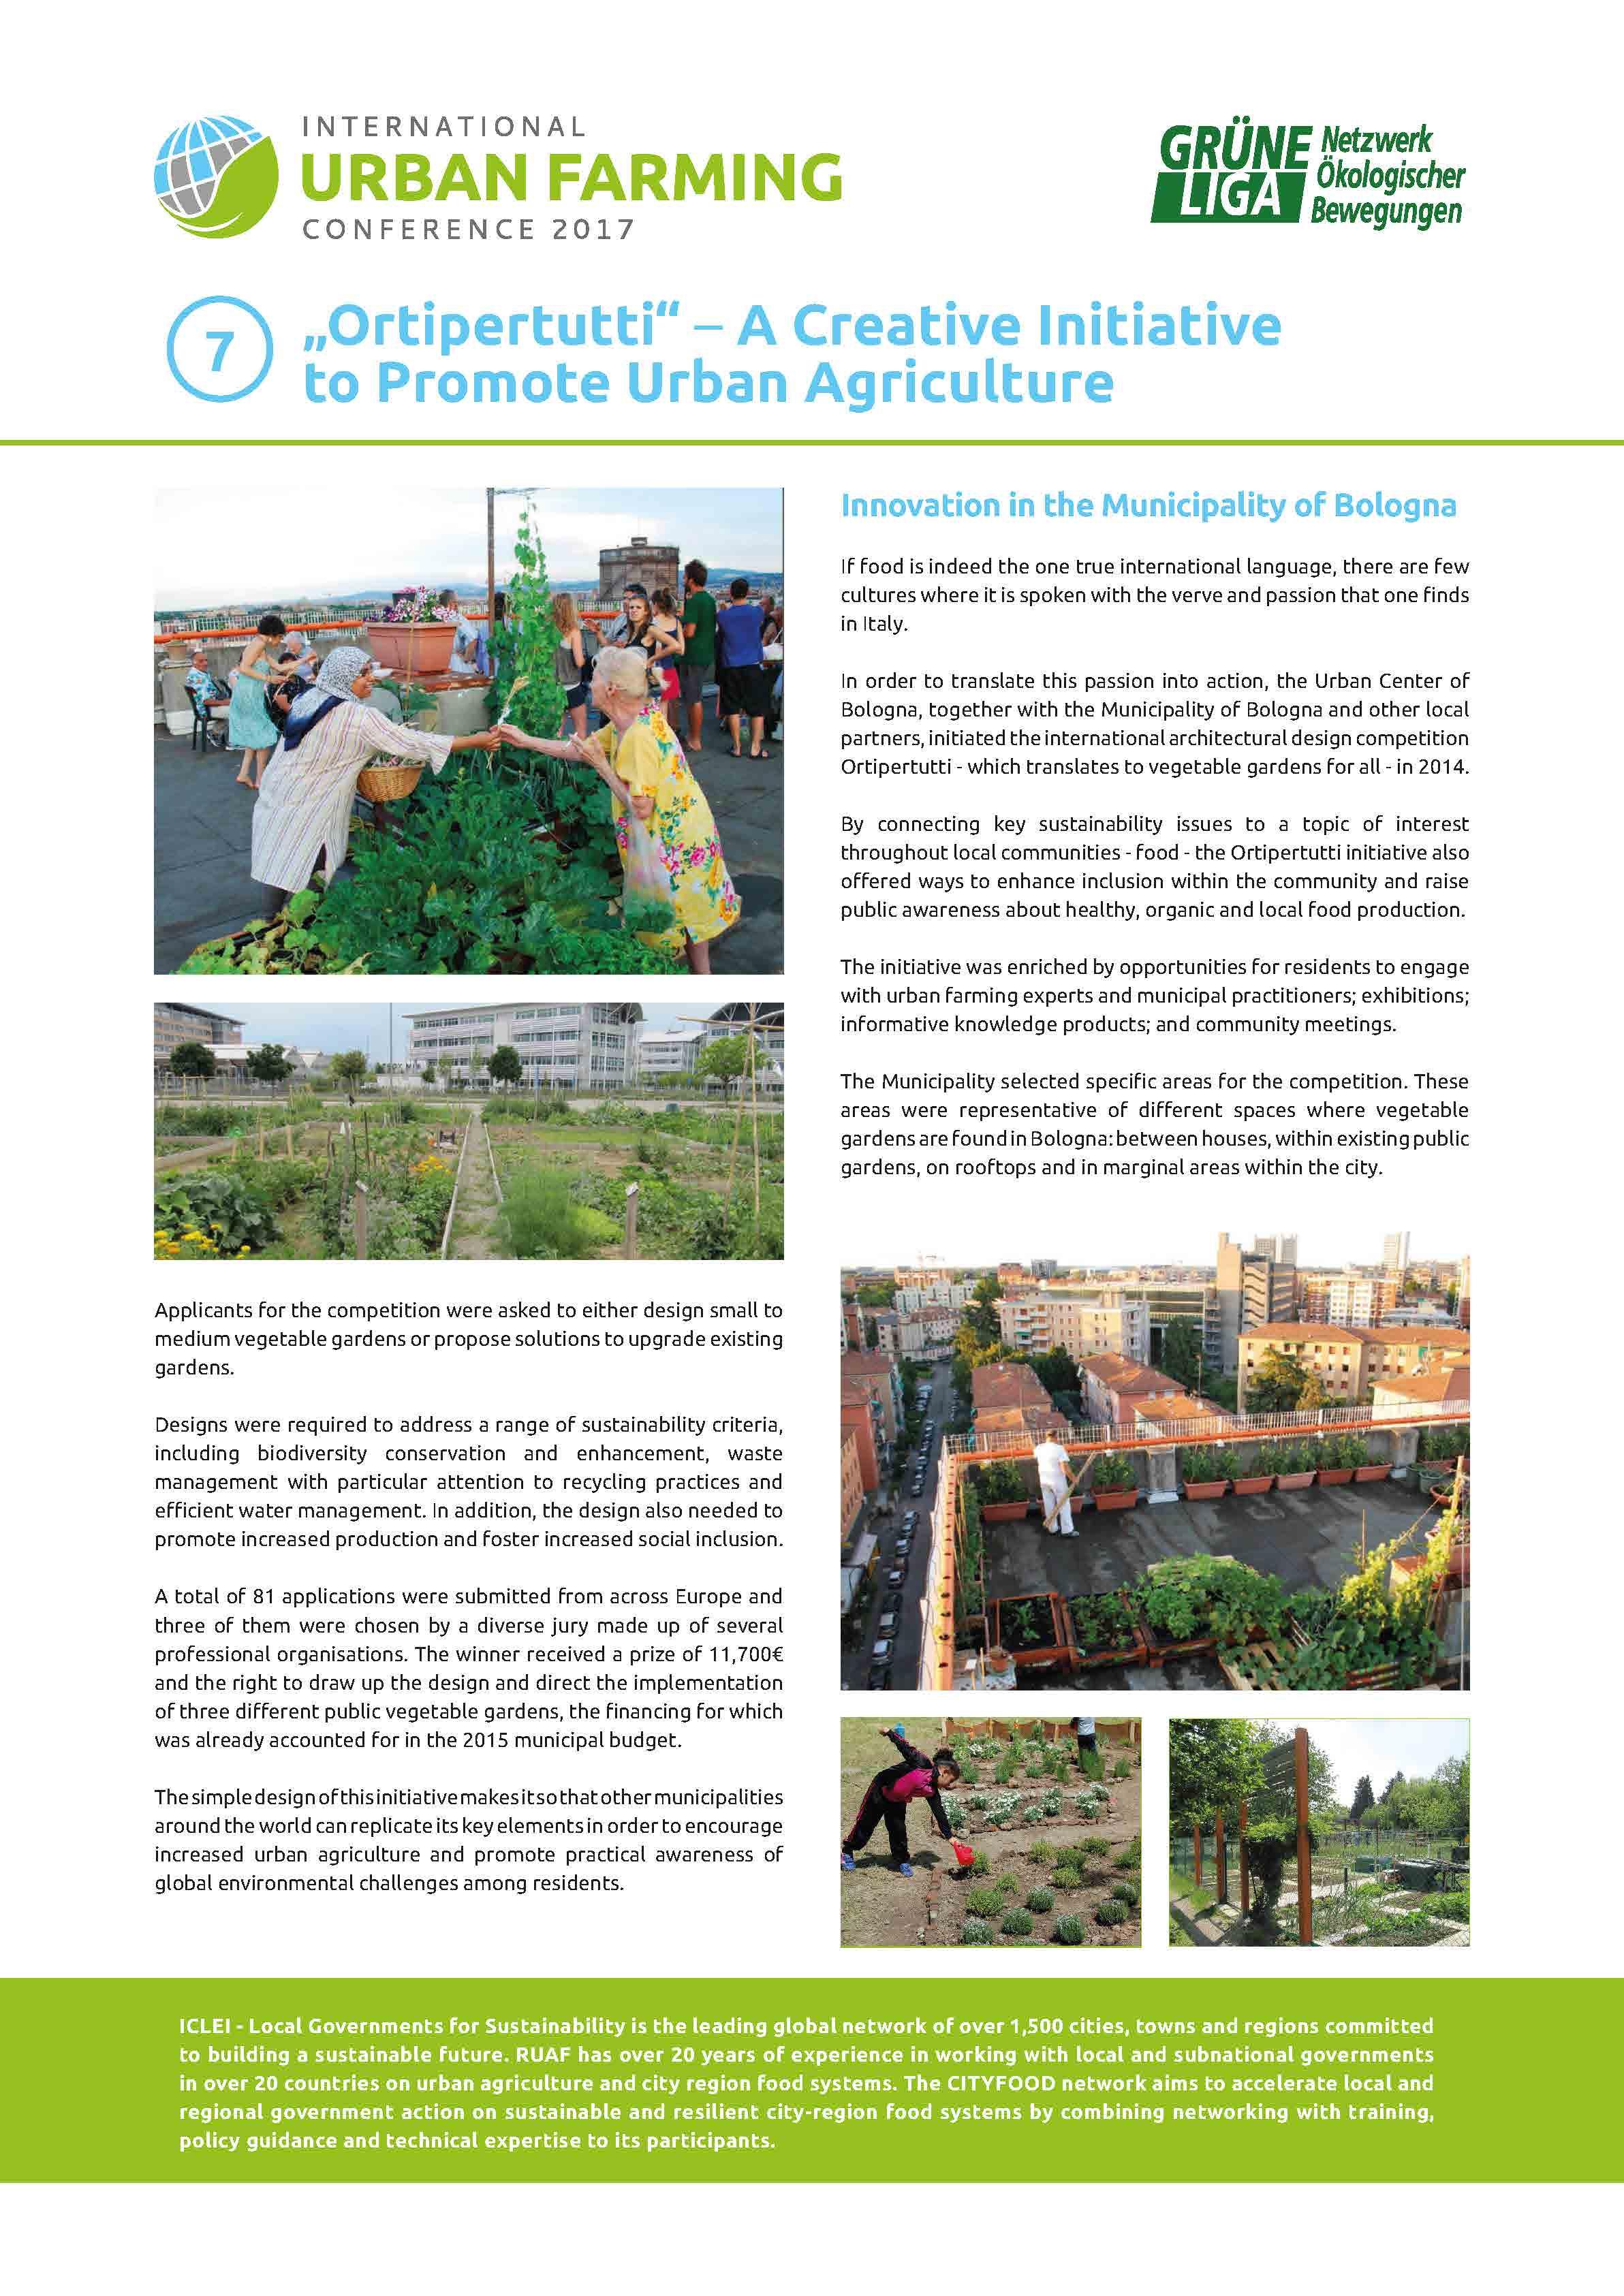 Astonishing Documentation International Urban Farming Conference Grune Download Free Architecture Designs Scobabritishbridgeorg